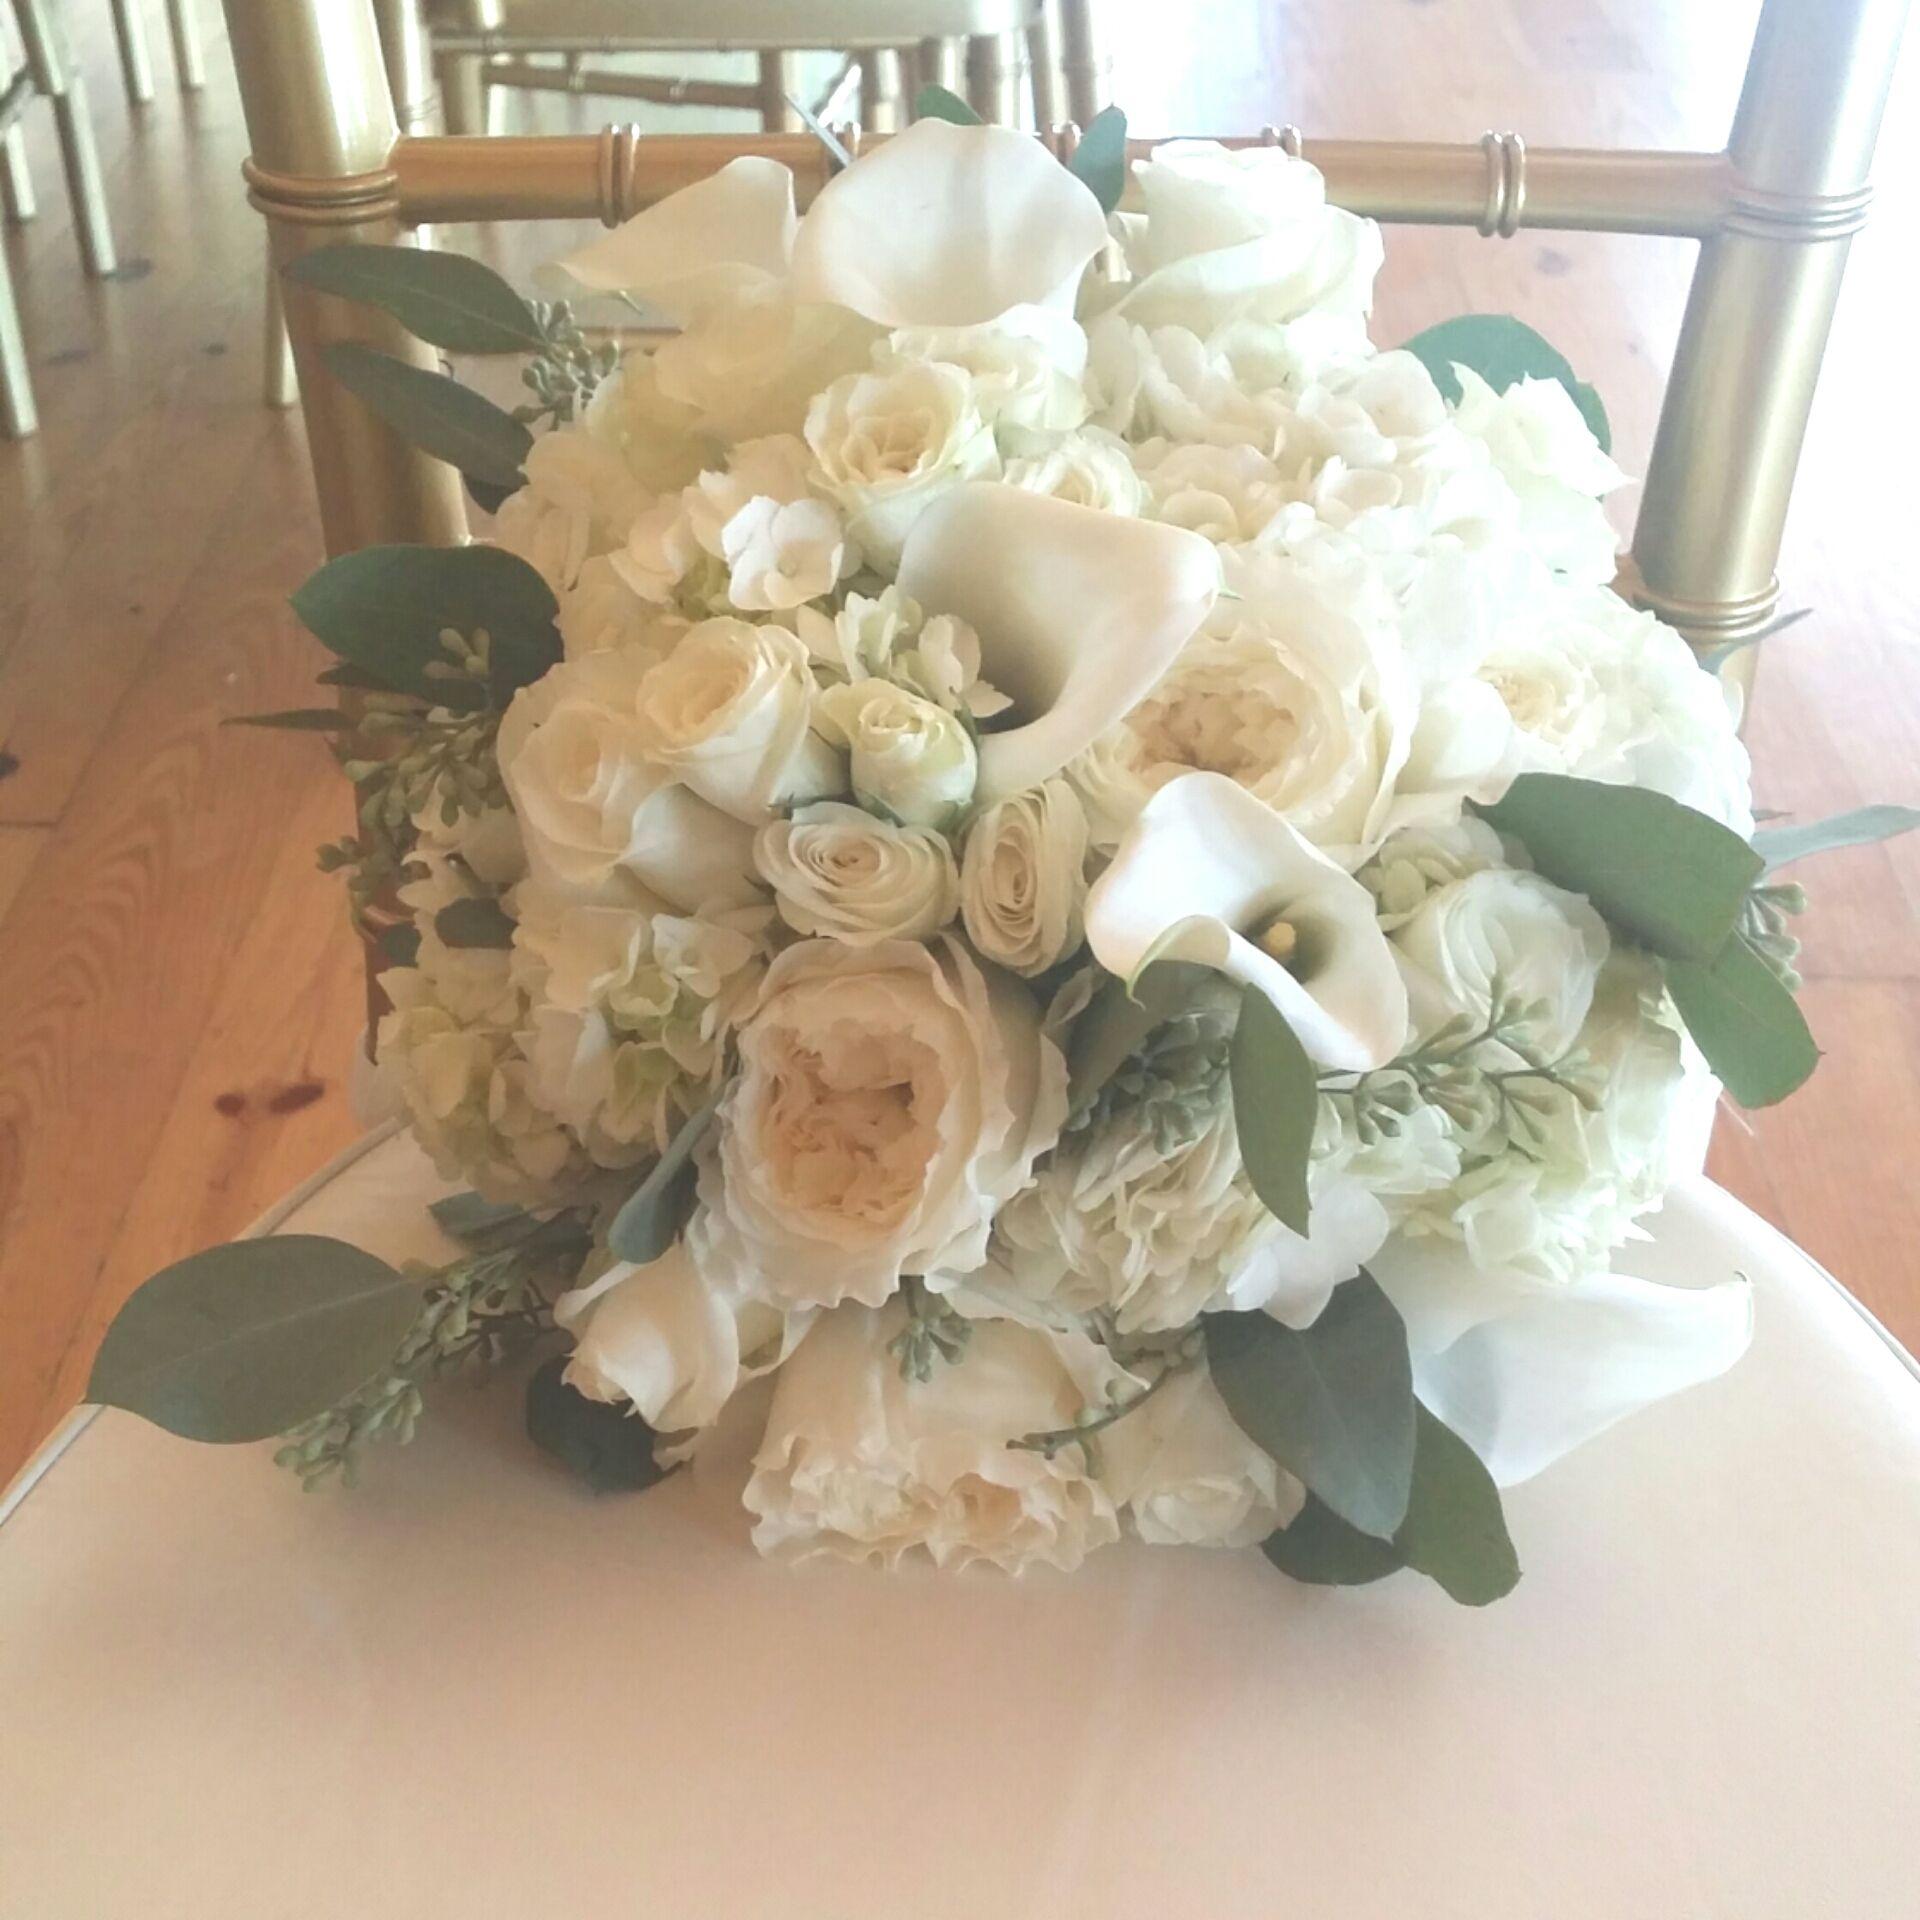 bride bouquet elegance hydrangea garden roses calla lily white roses white